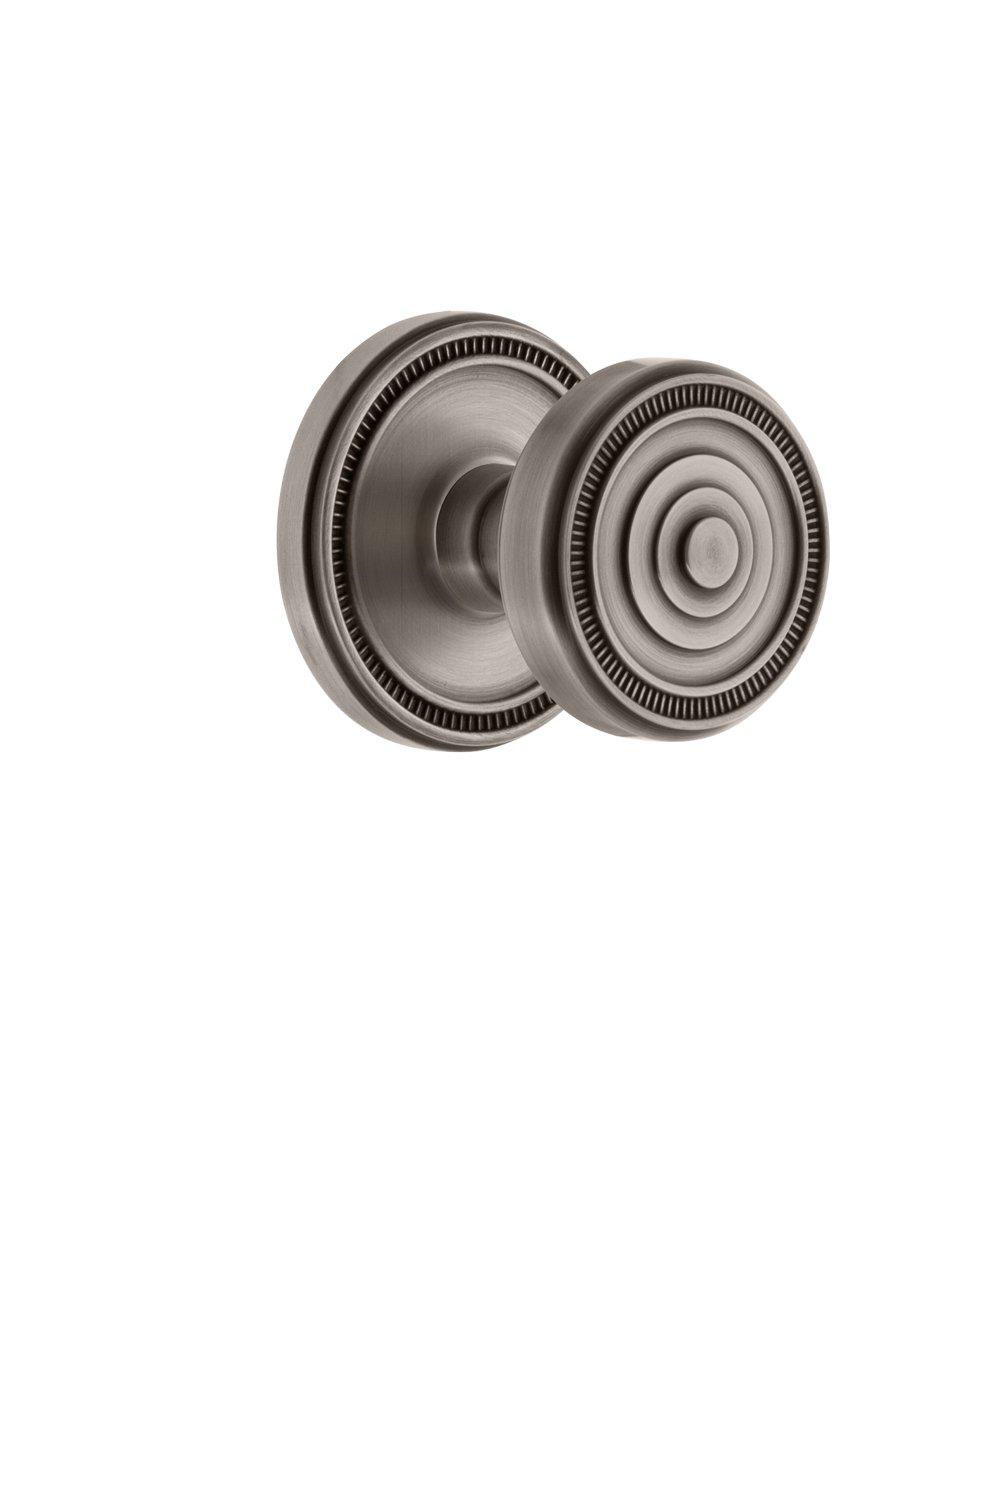 Grandeur 809231 Soleil Rosette Passage with Soleil Knob, Lifetime Brass Grandeur Hardware